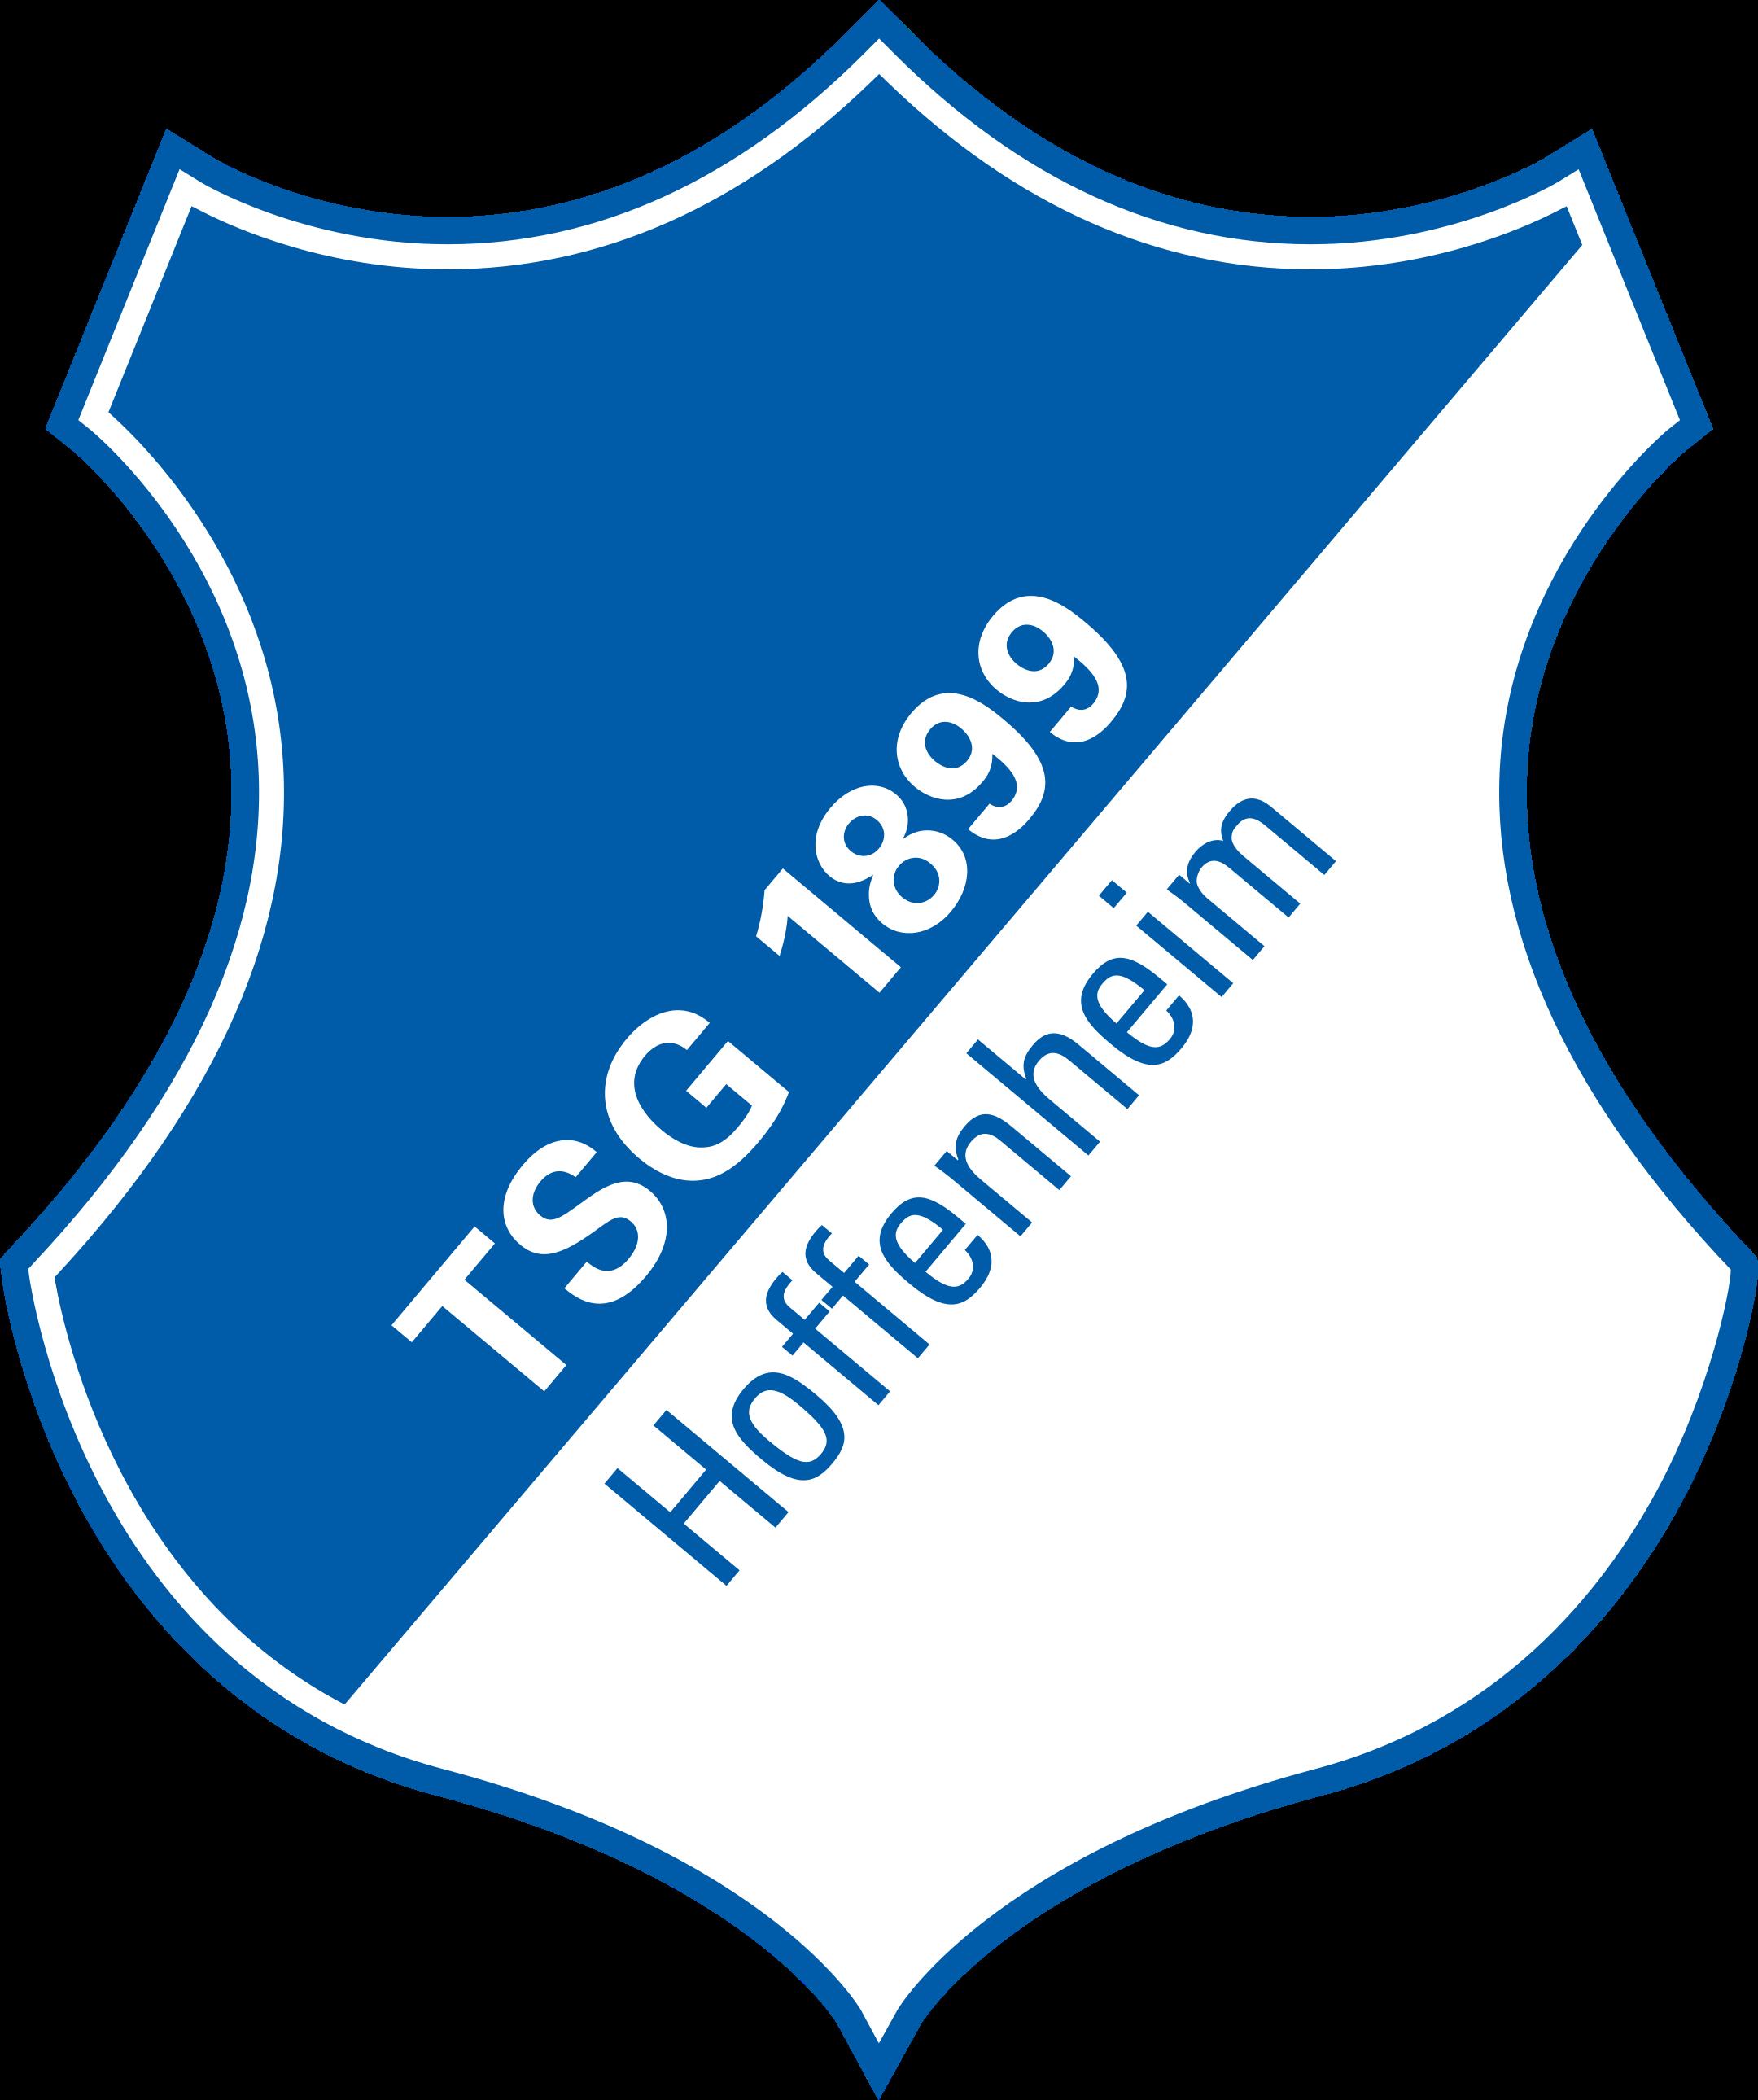 hoffenheim logo 1 - Hoffenheim Logo